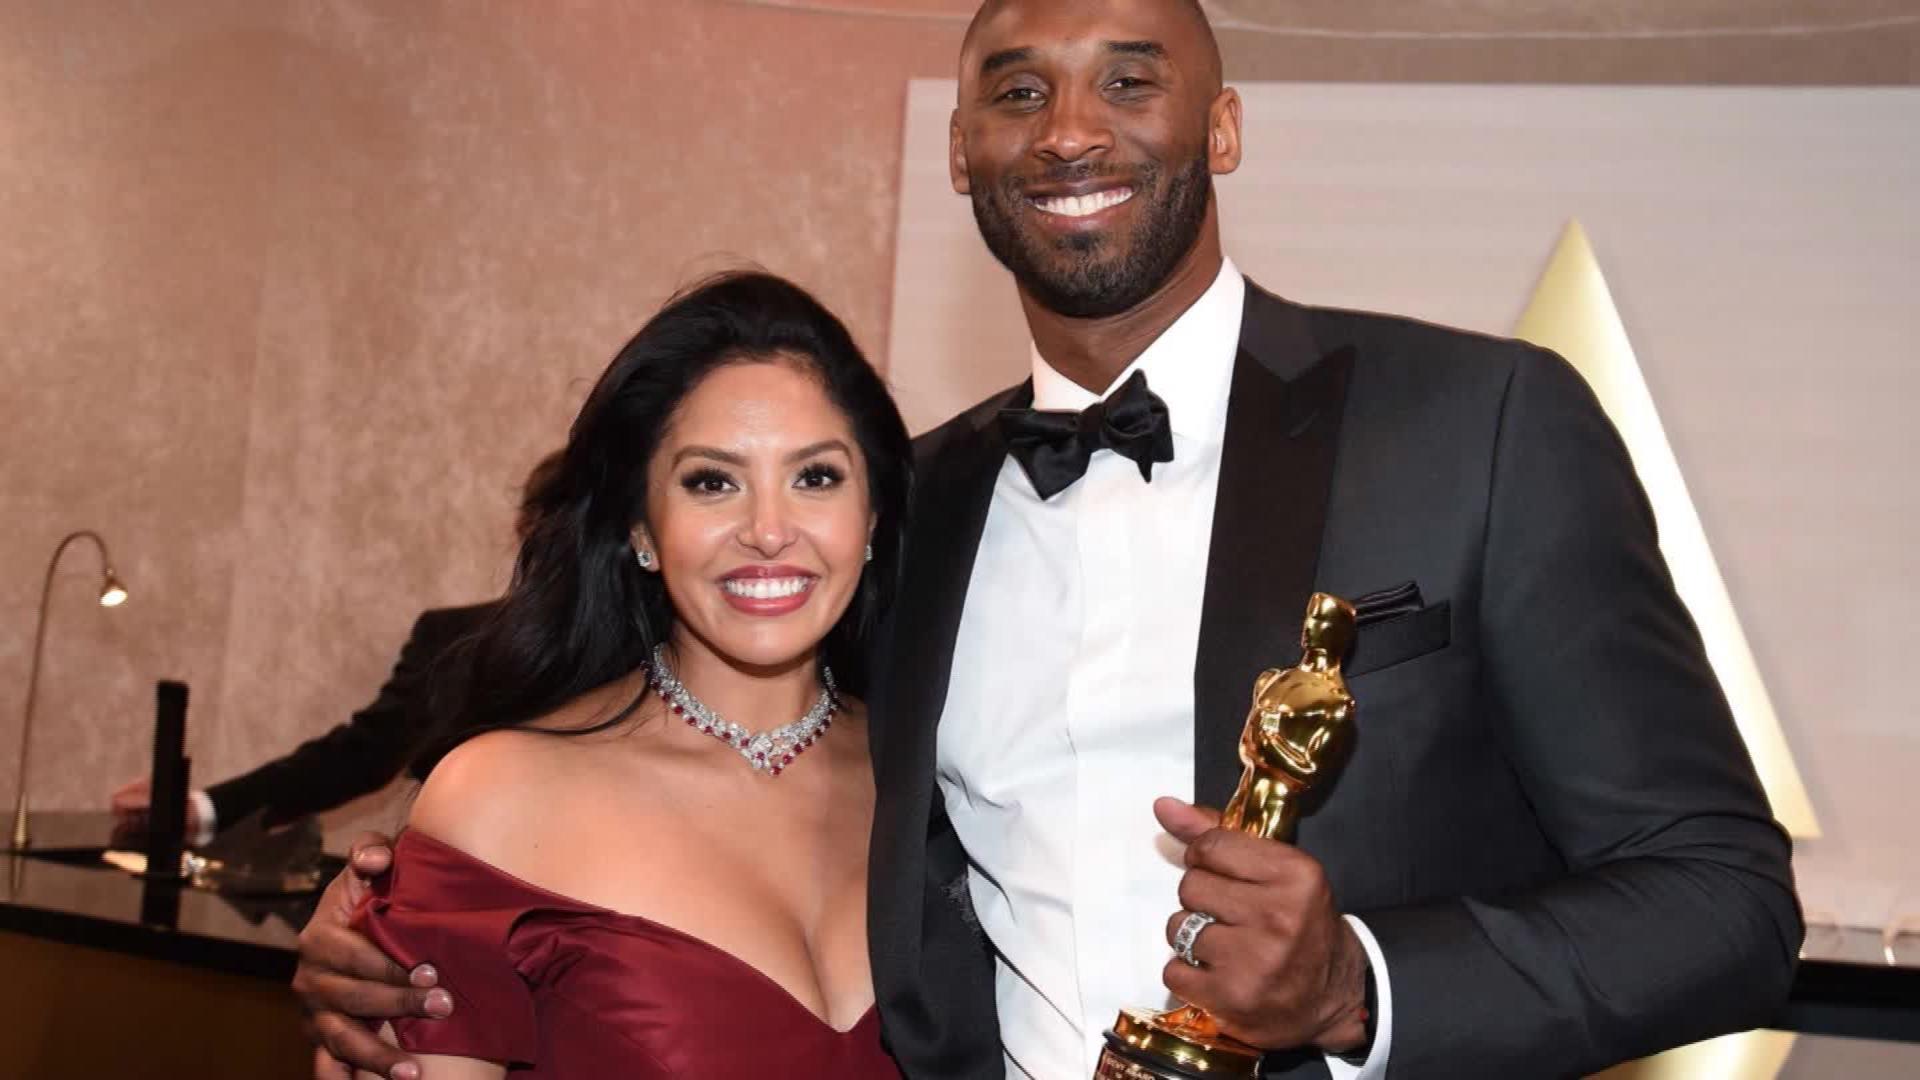 Vanessa and Kobe Bryant at the Oscars